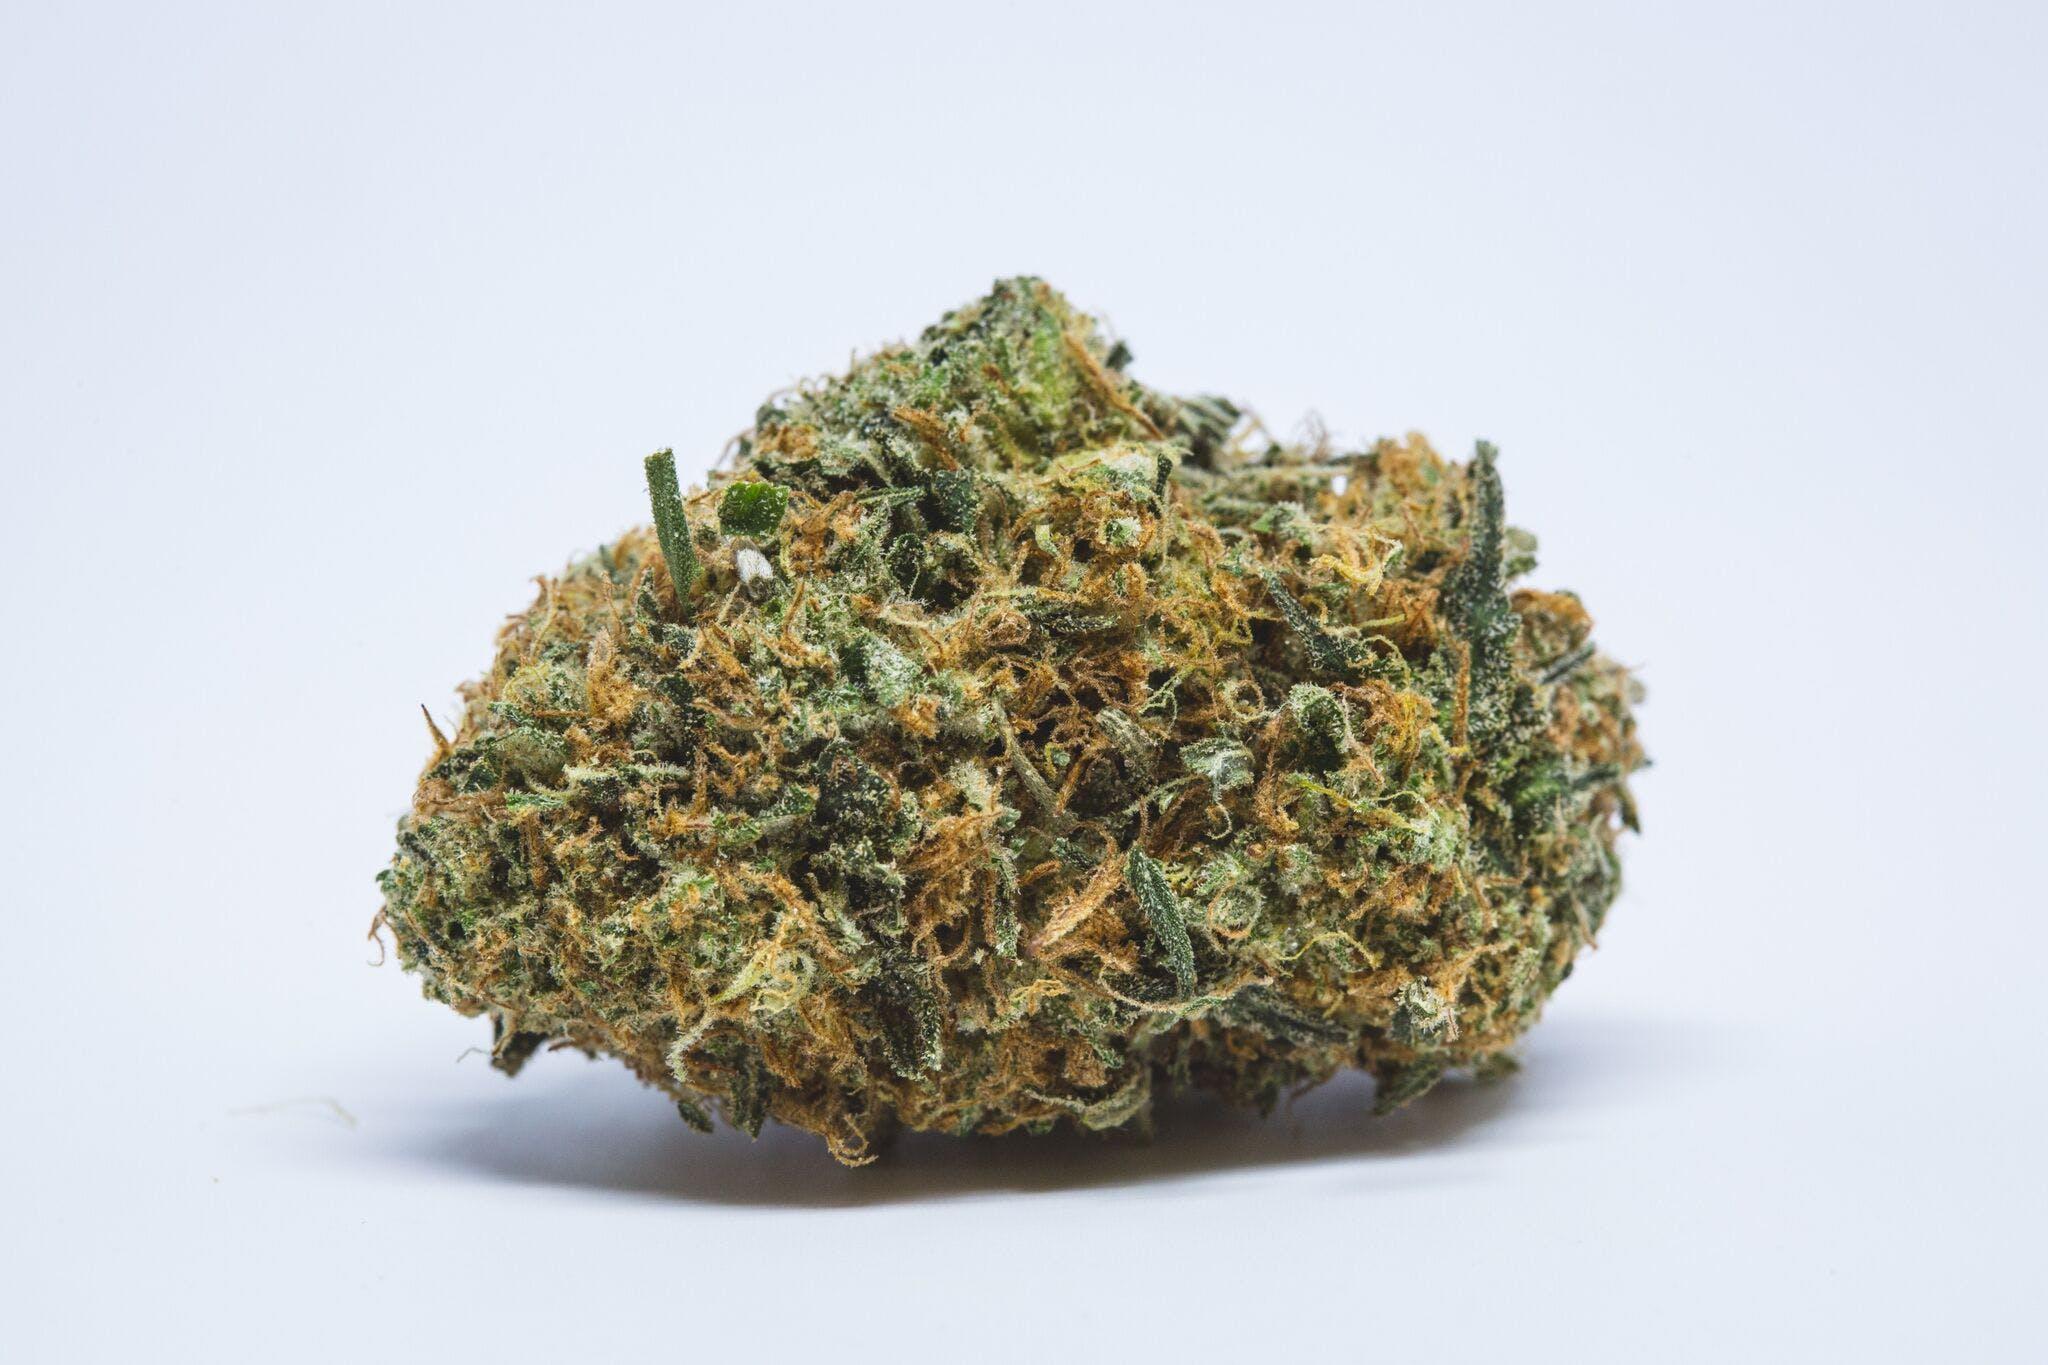 Banana Diesel Weed, Banana Diesel Cannabis Strain; Banana Diesel Hybrid Marijuana Strain